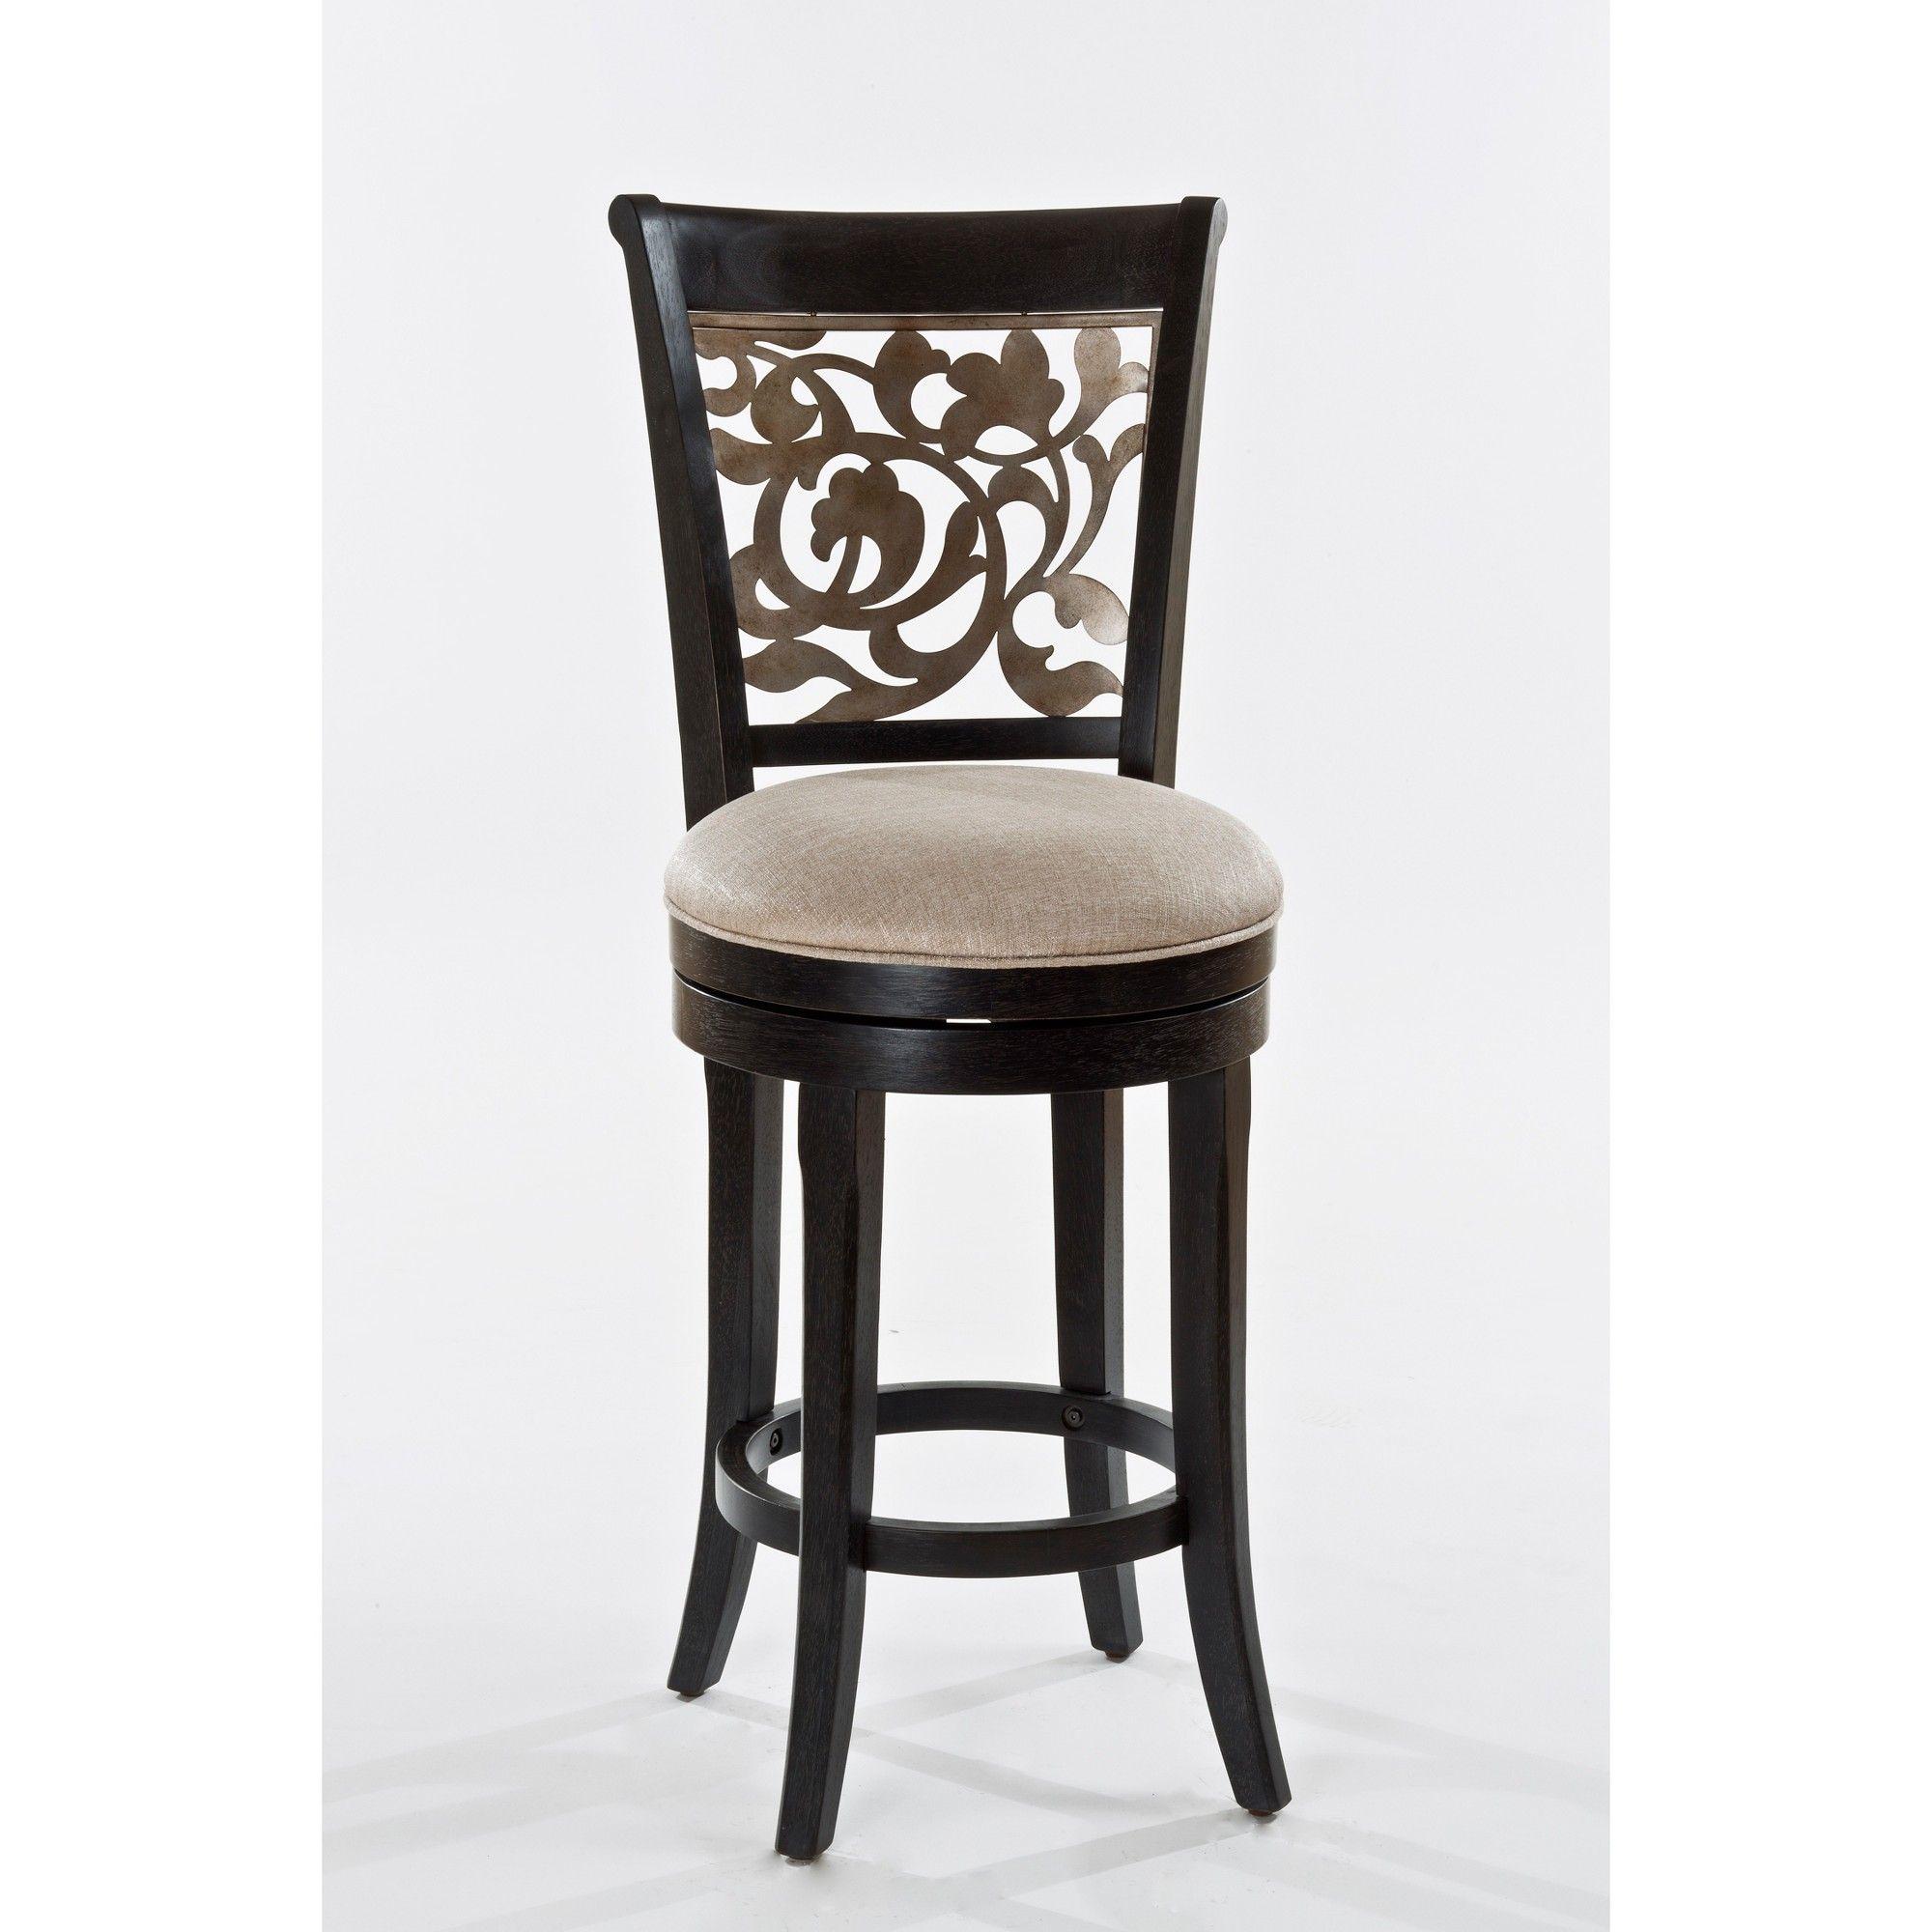 Wondrous 26 Bennington Swivel Counter Stool Wood Black Hillsdale Andrewgaddart Wooden Chair Designs For Living Room Andrewgaddartcom